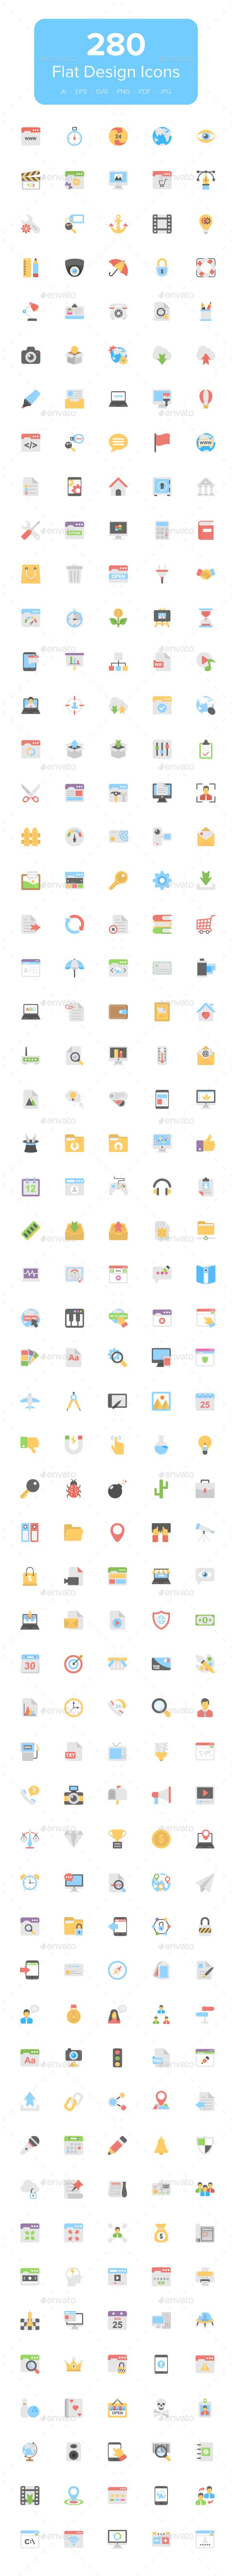 280 Flat Design Icons - Icons